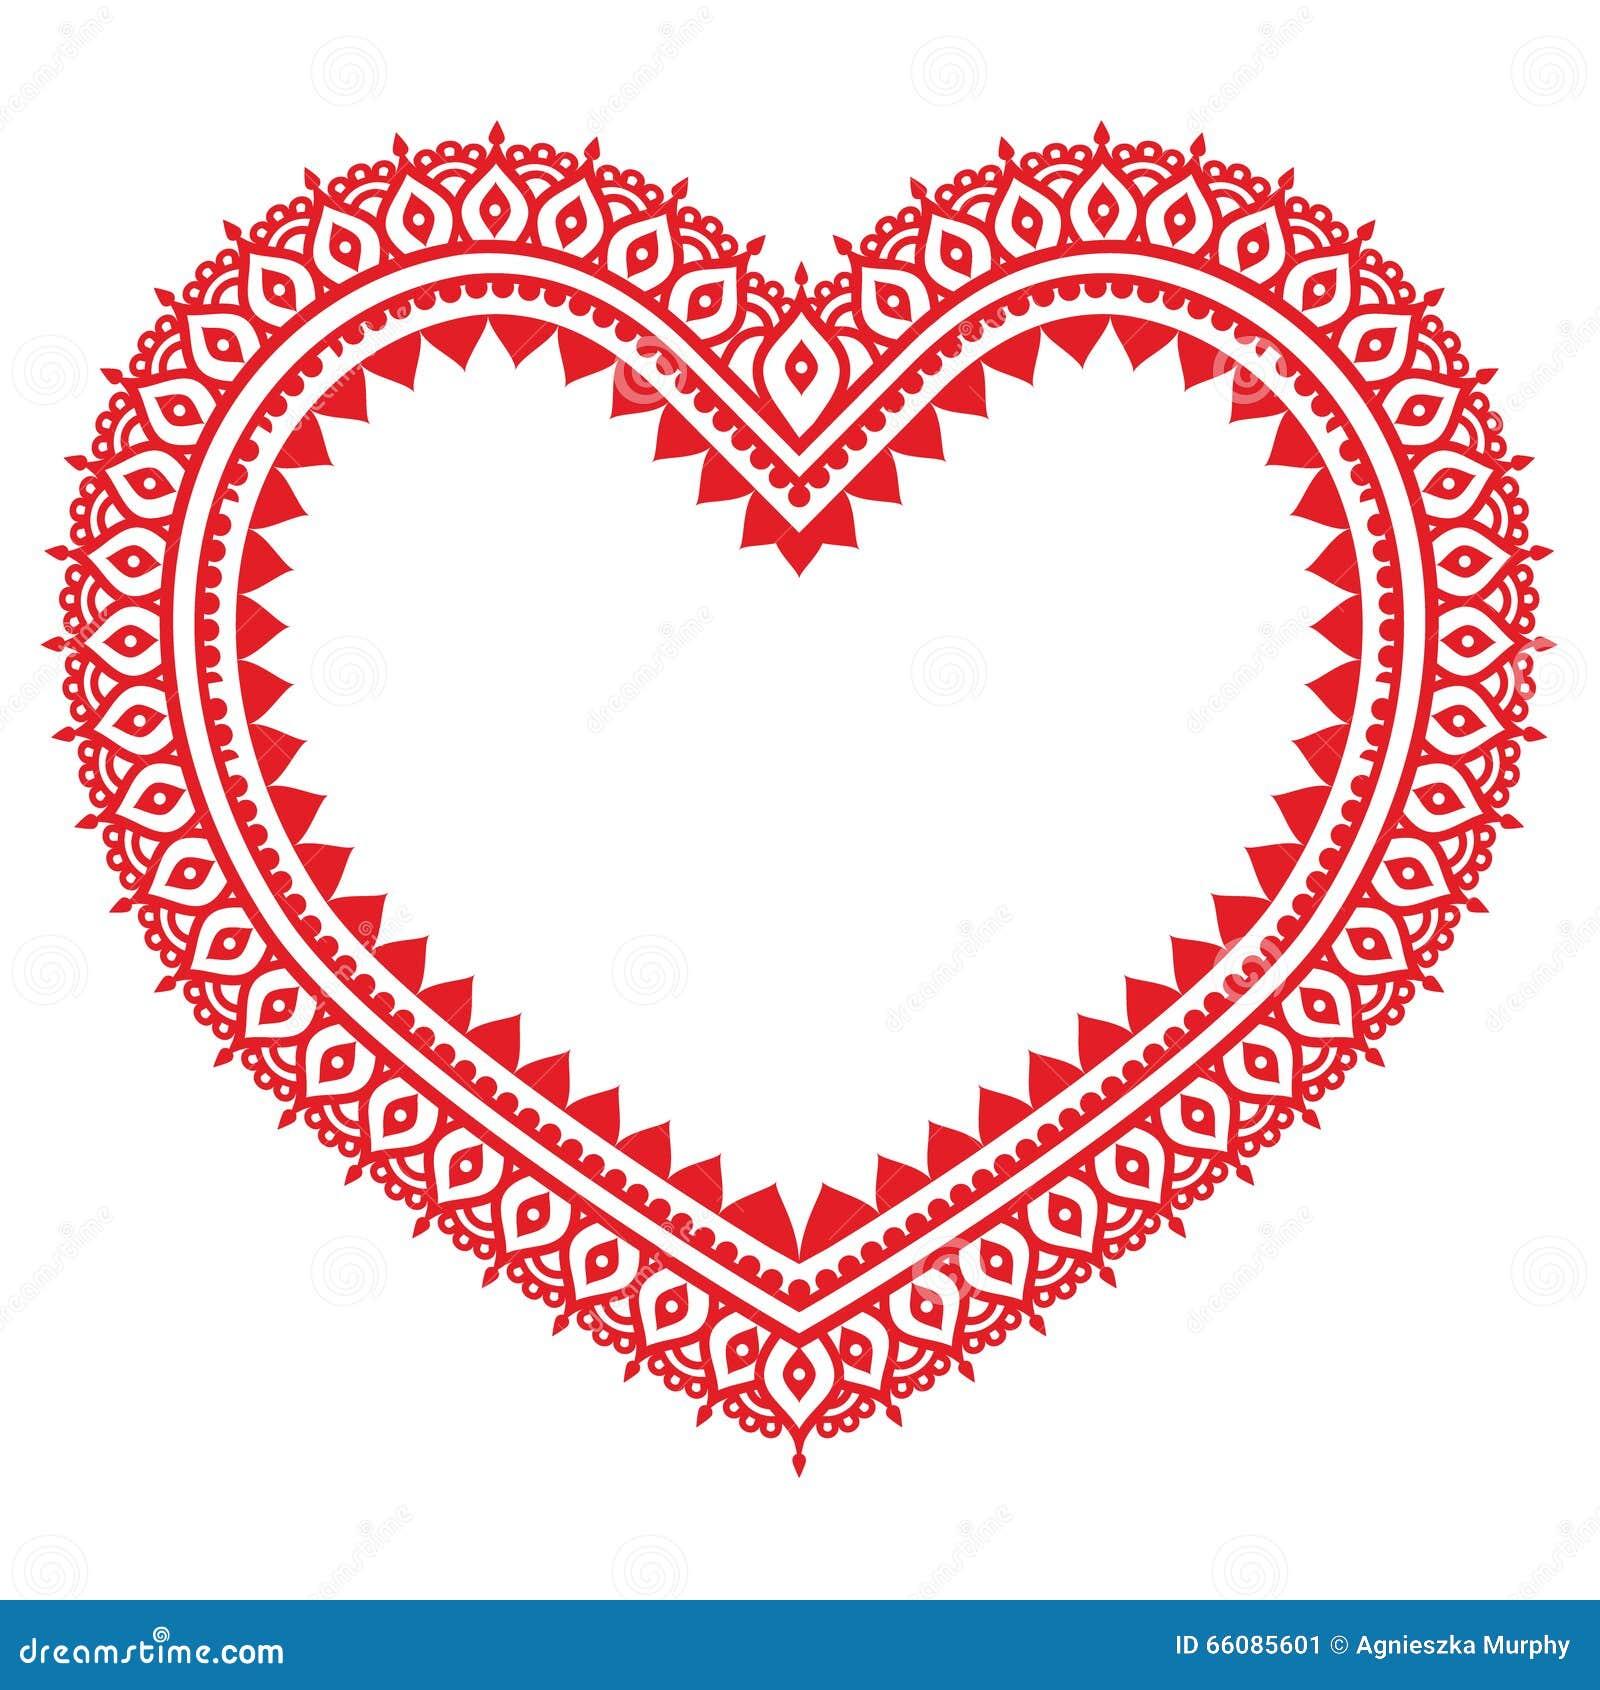 Heart Red Mehndi Design Indian Henna Tattoo Pattern Stock